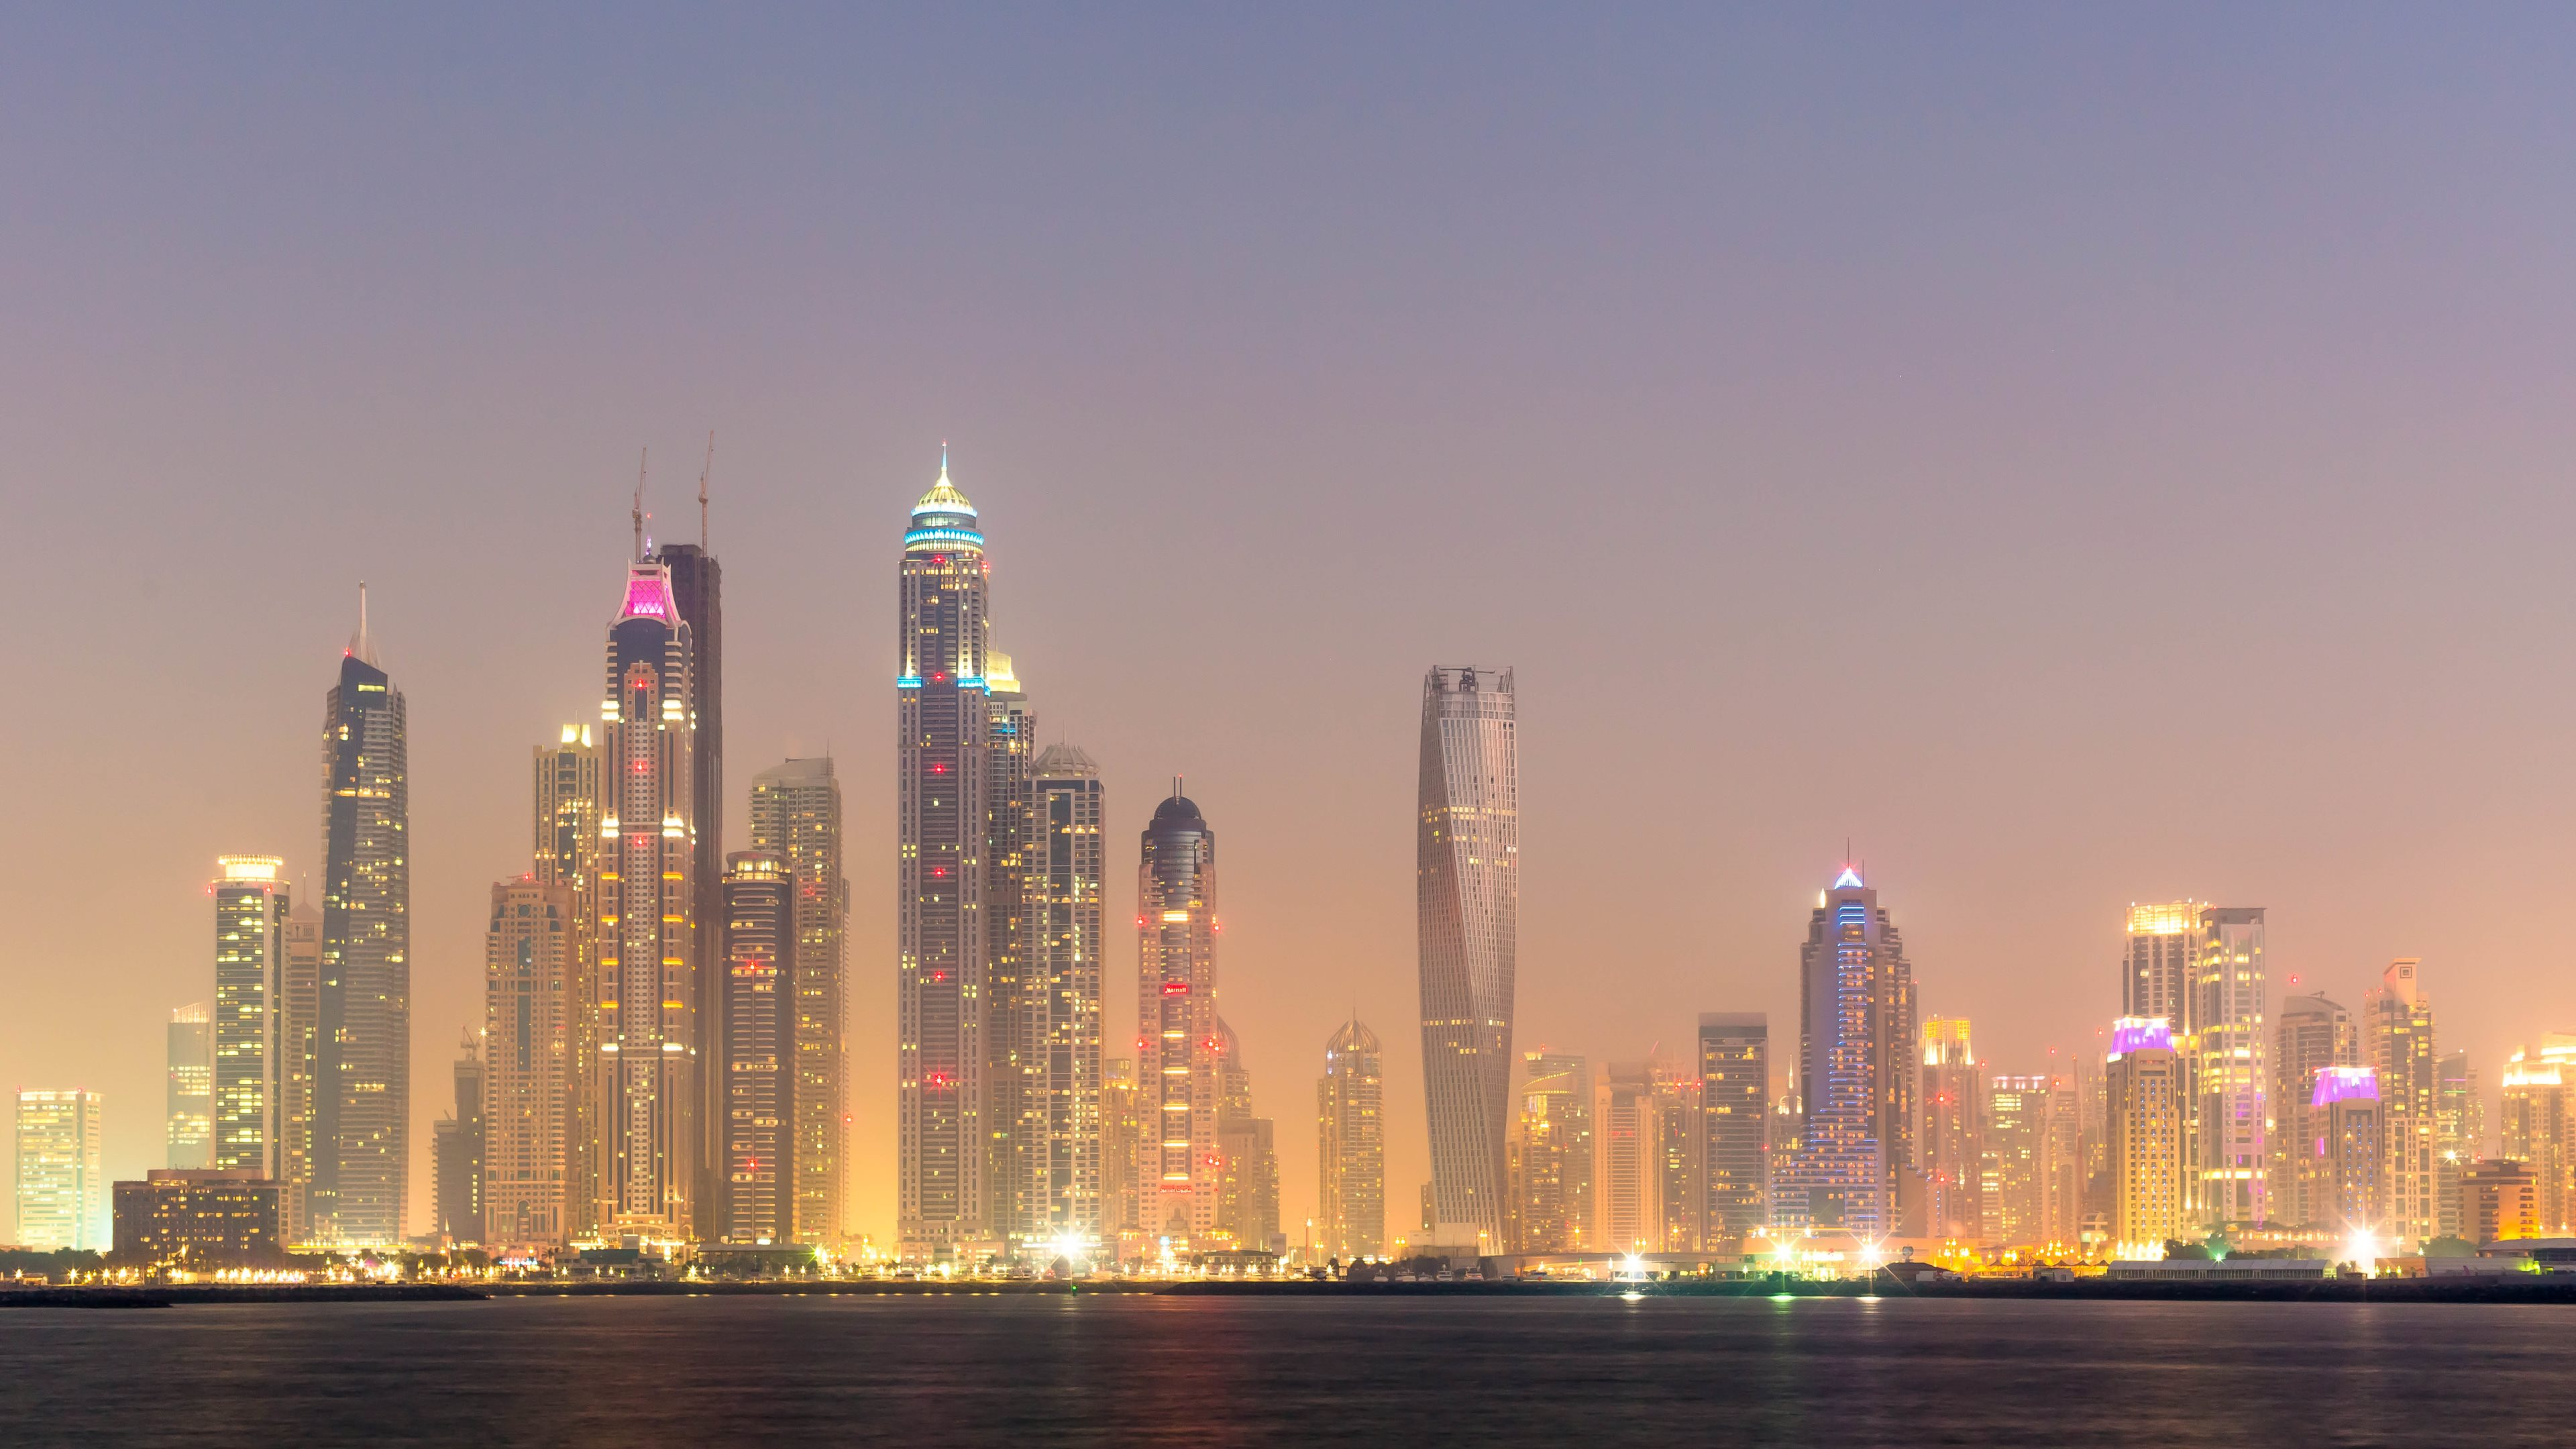 Dubai Lights 4K Wallpaper [3840x2160]